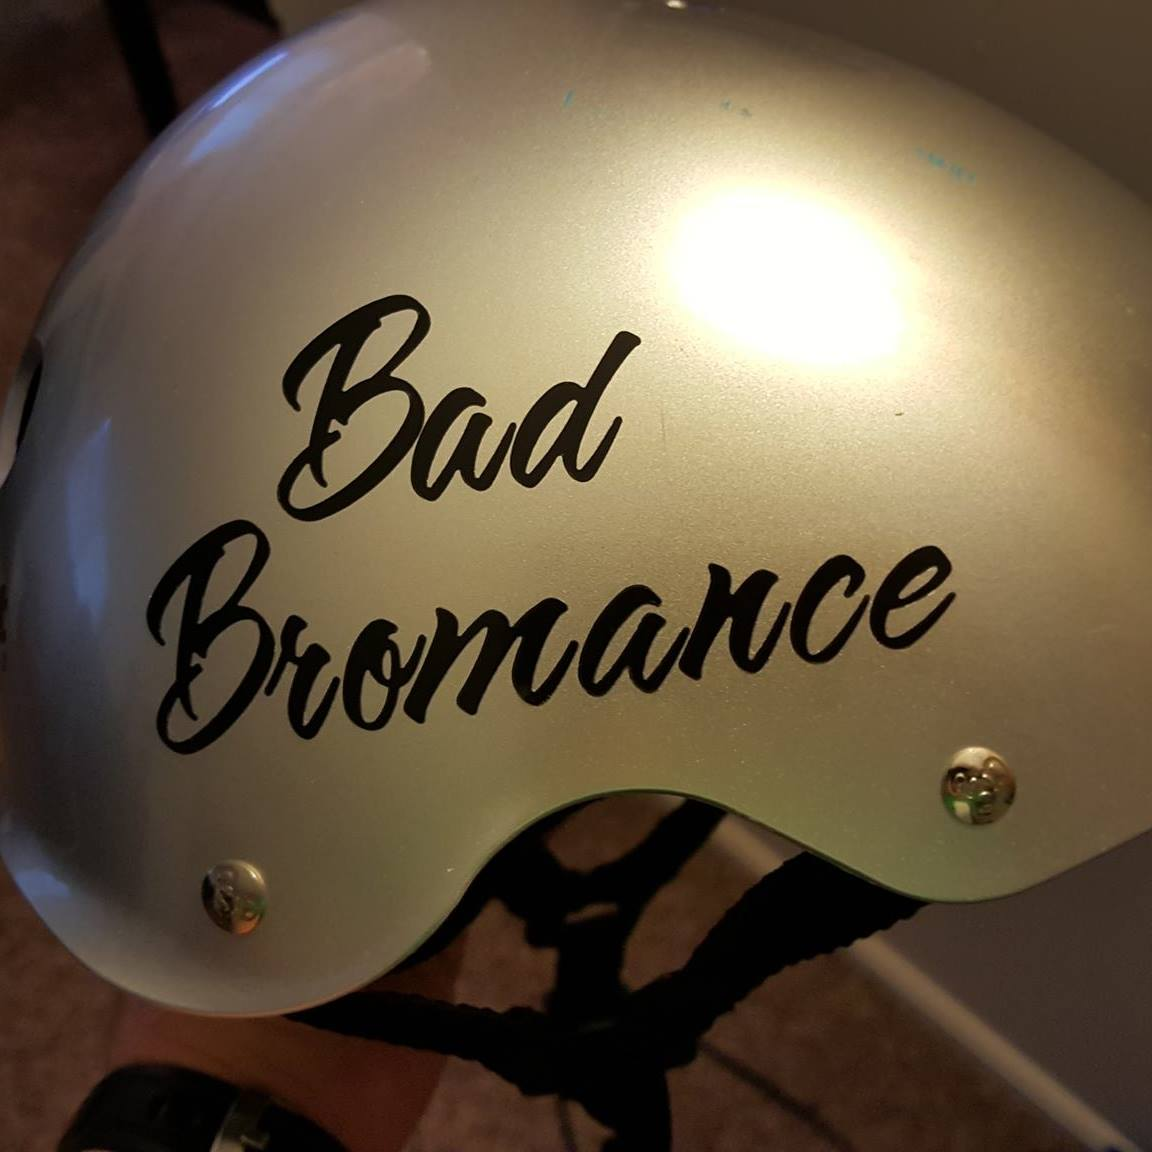 Bradley Drake [Bad Bromance]